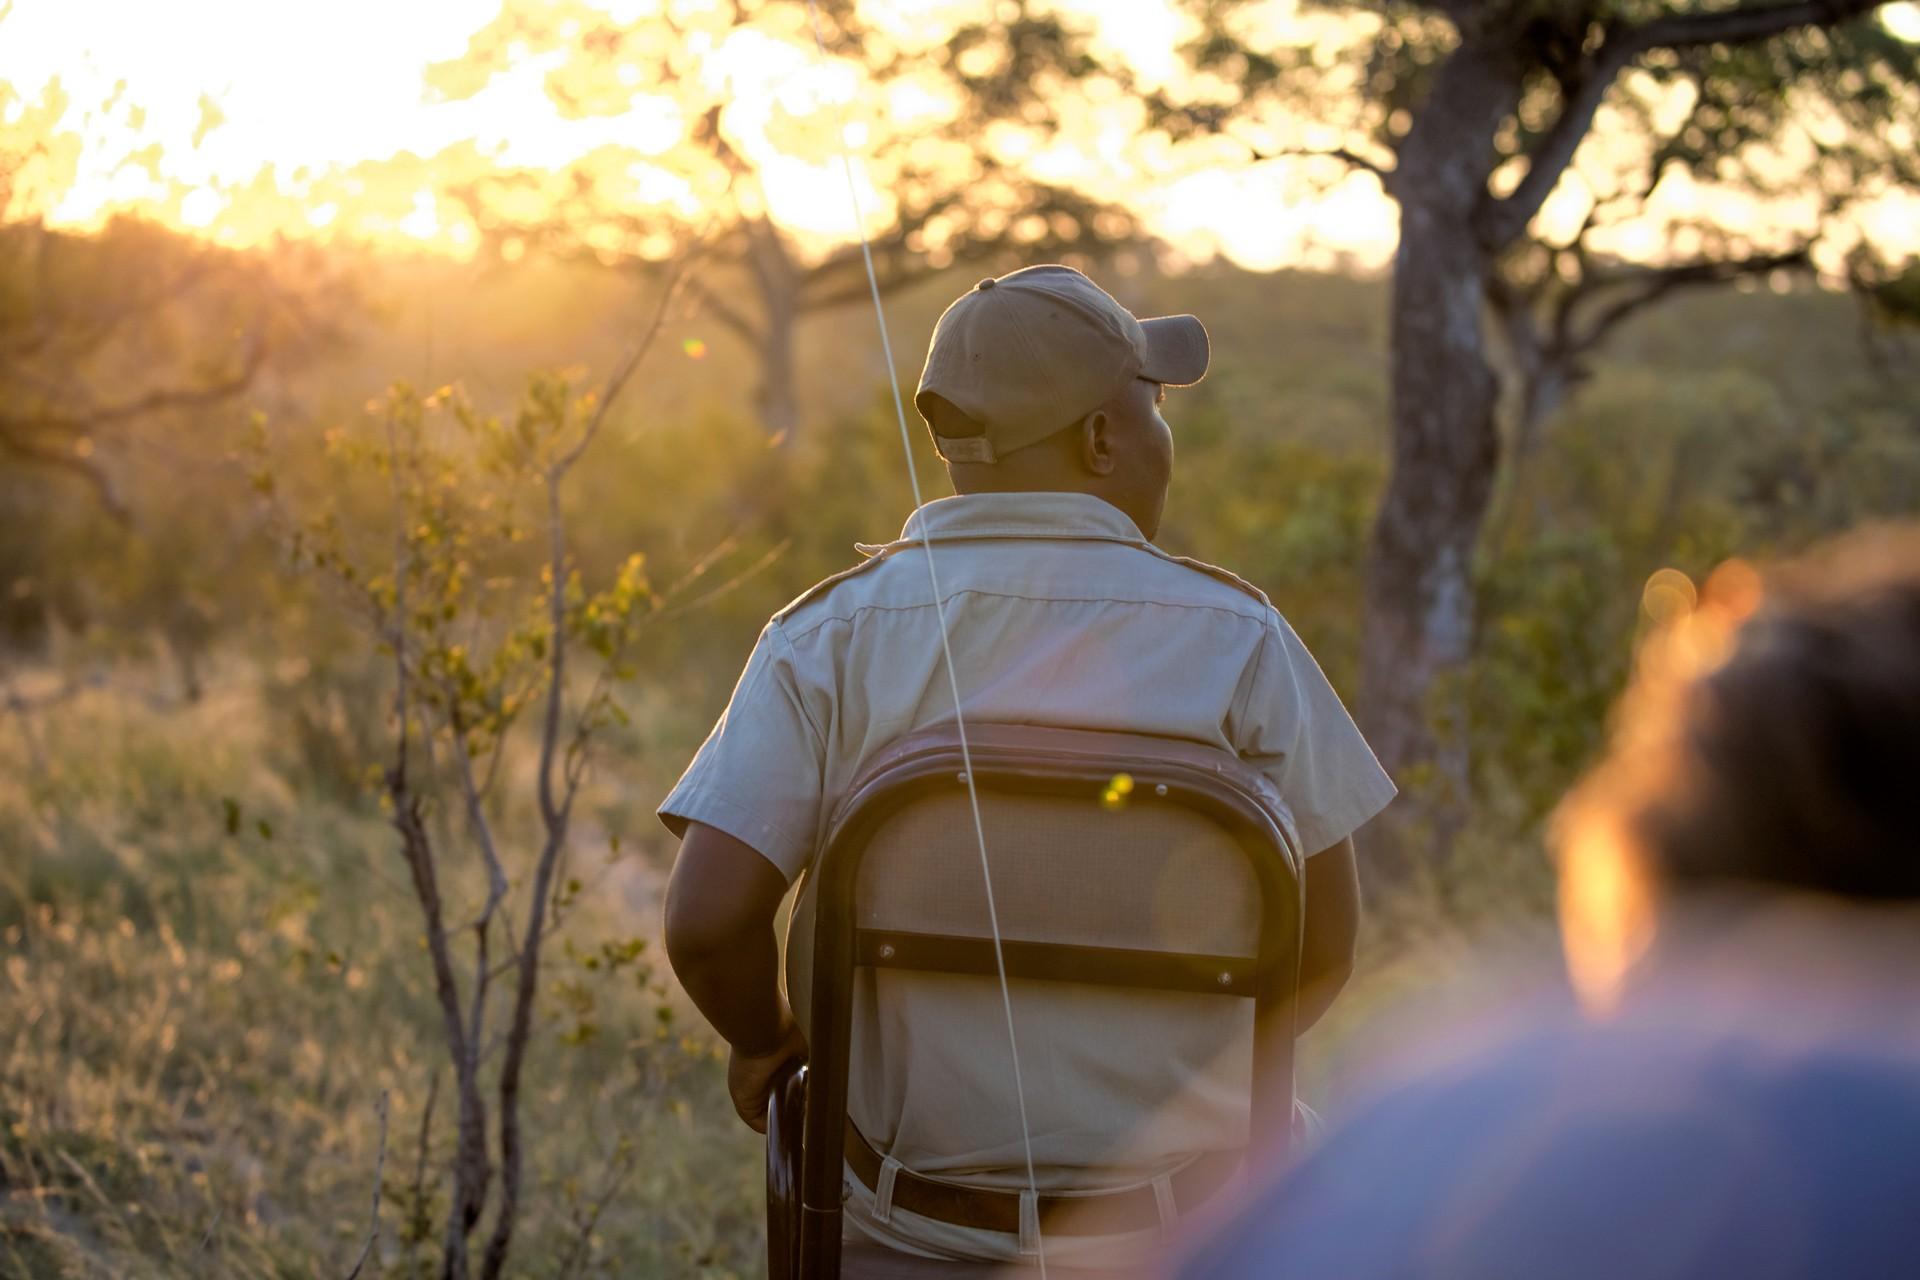 Safari tracker on vehicle in Kenya